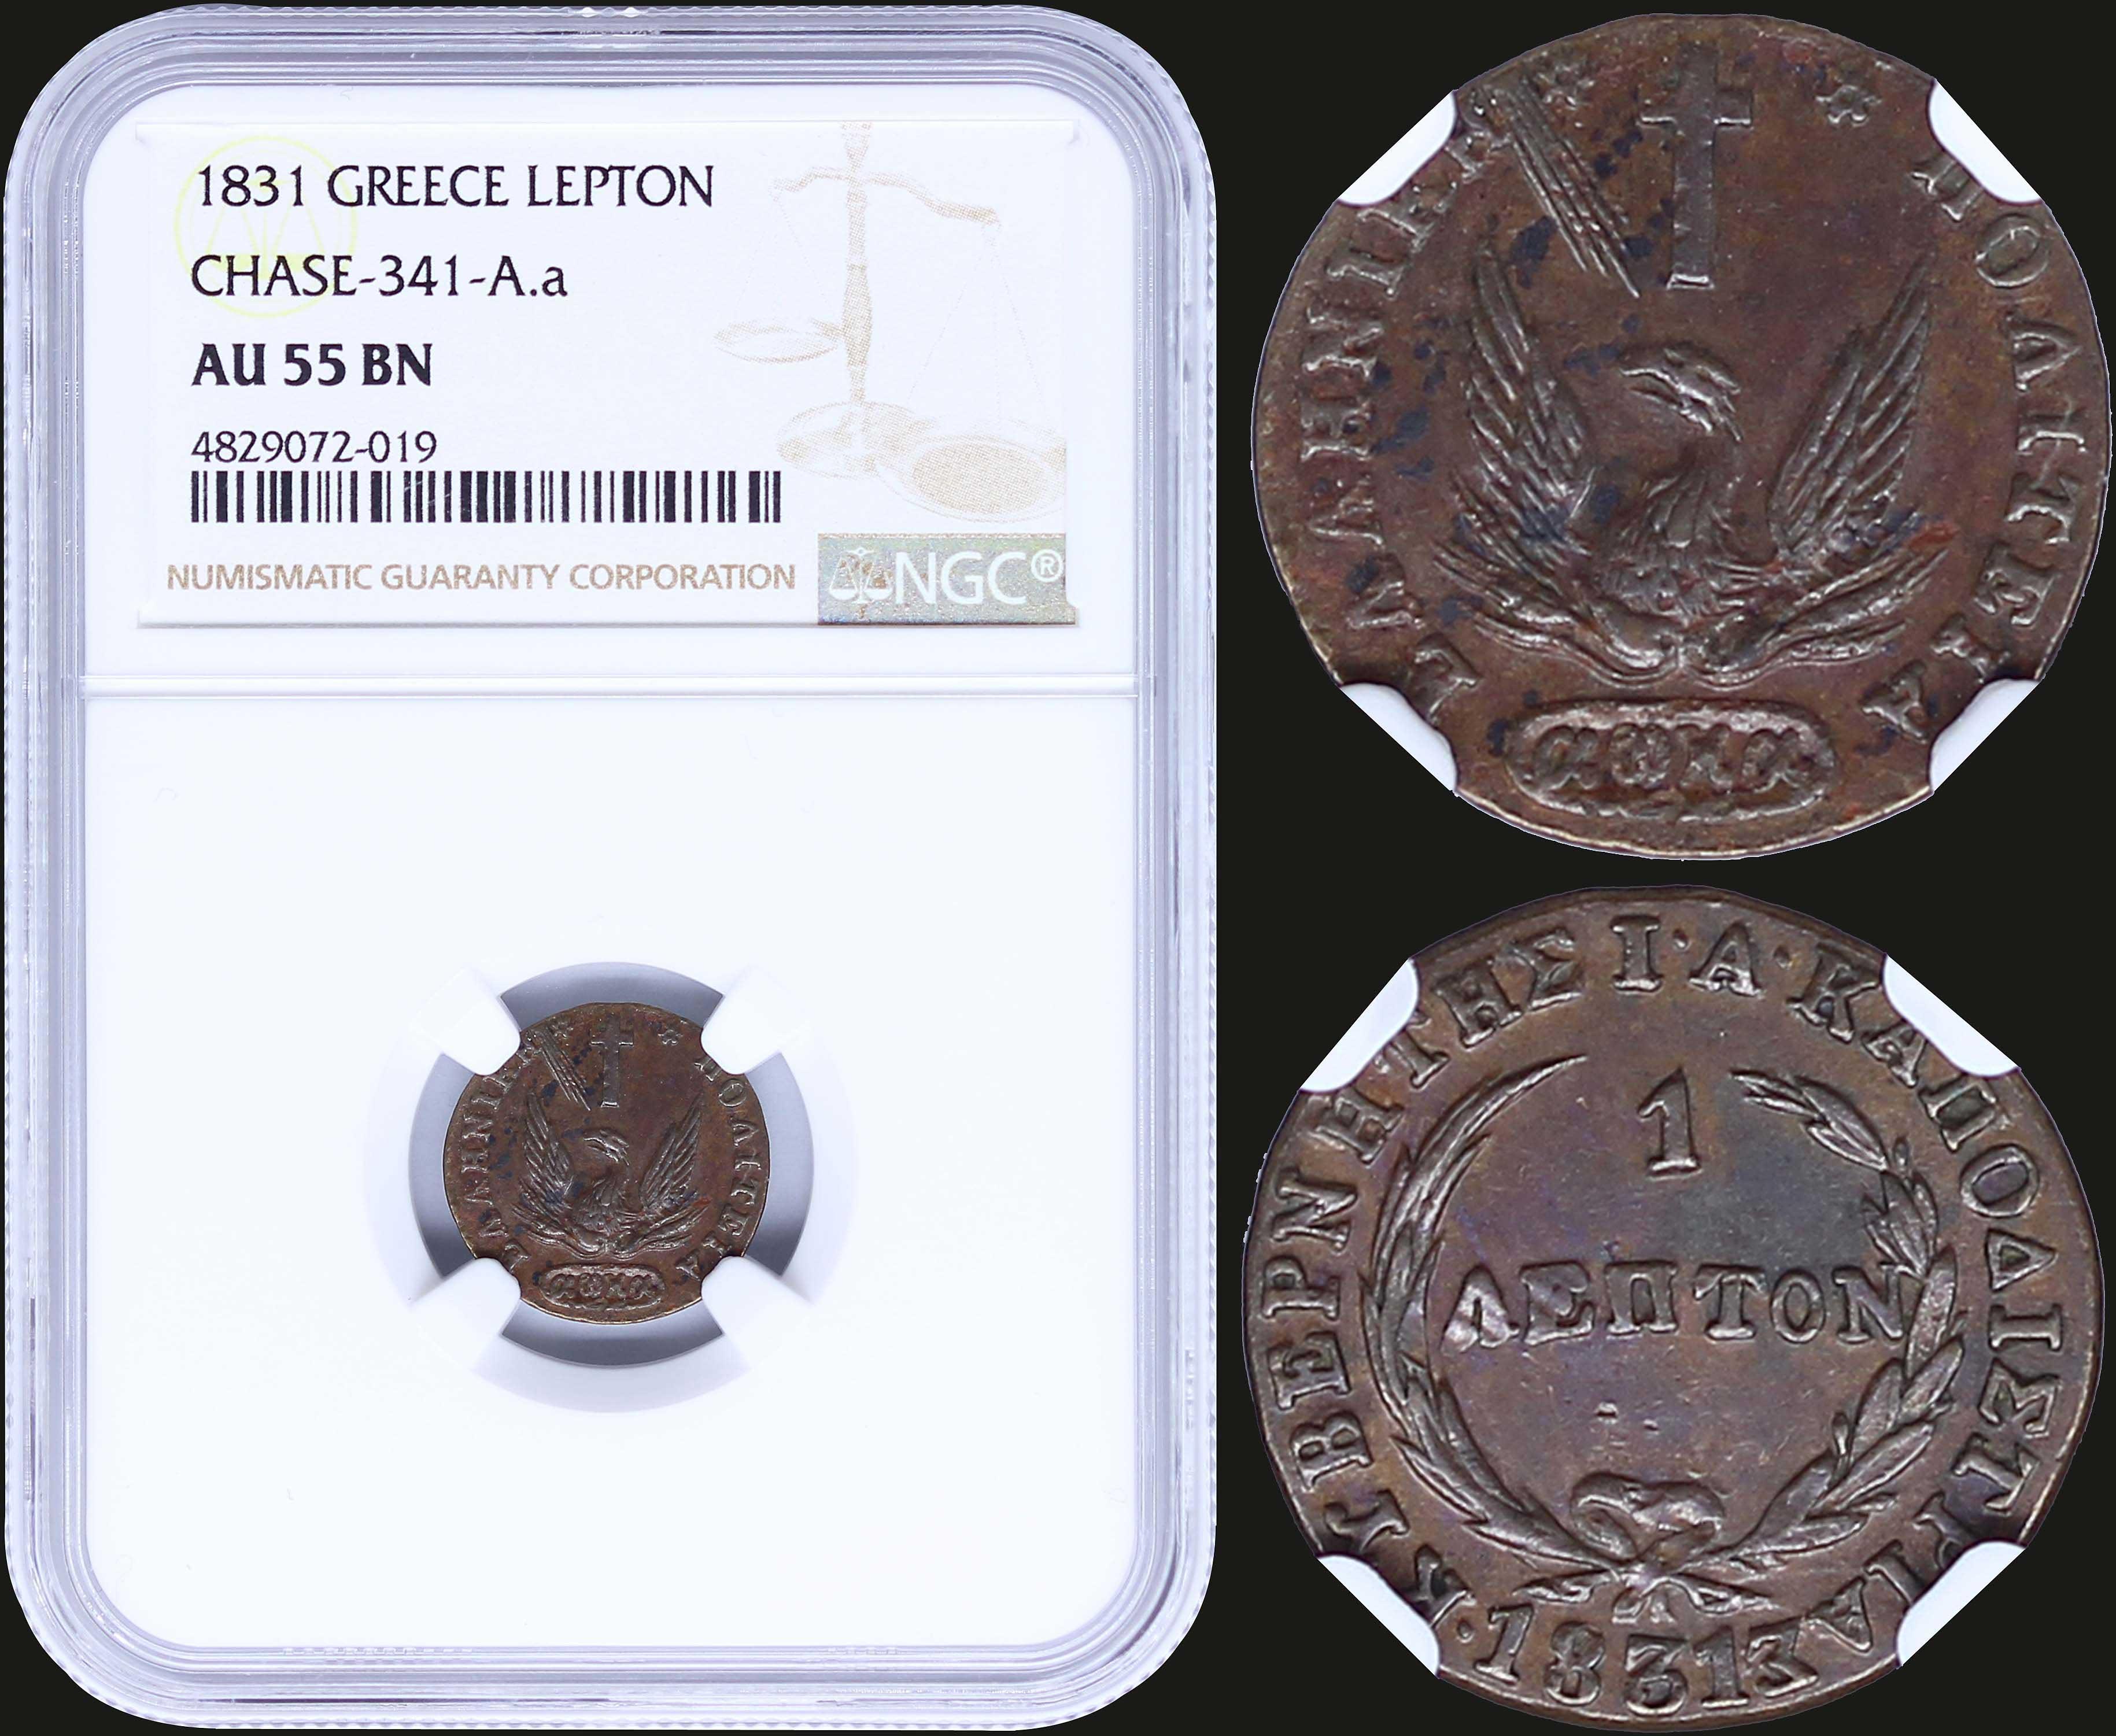 Lot 6025 - -  COINS & TOKENS governor capodistrias -  A. Karamitsos Public & Live Internet Auction 665 Coins, Medals & Banknotes